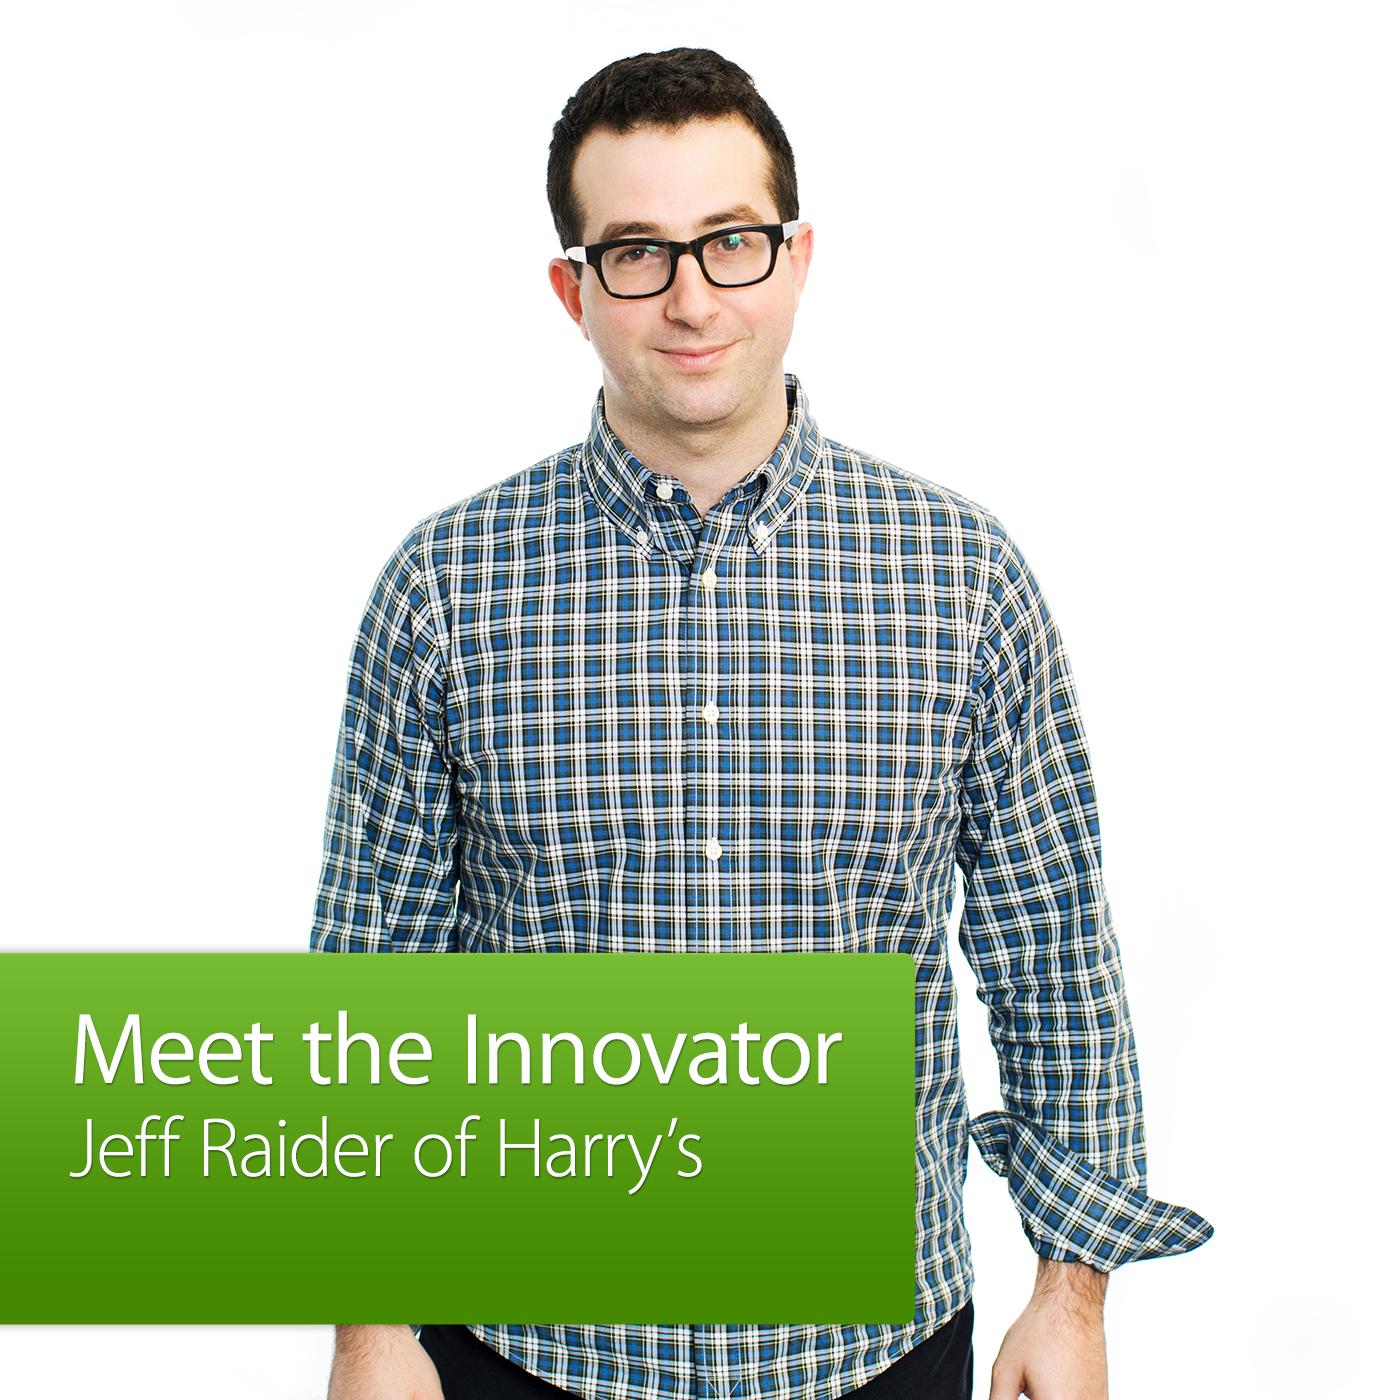 Harry's: Meet the Innovator